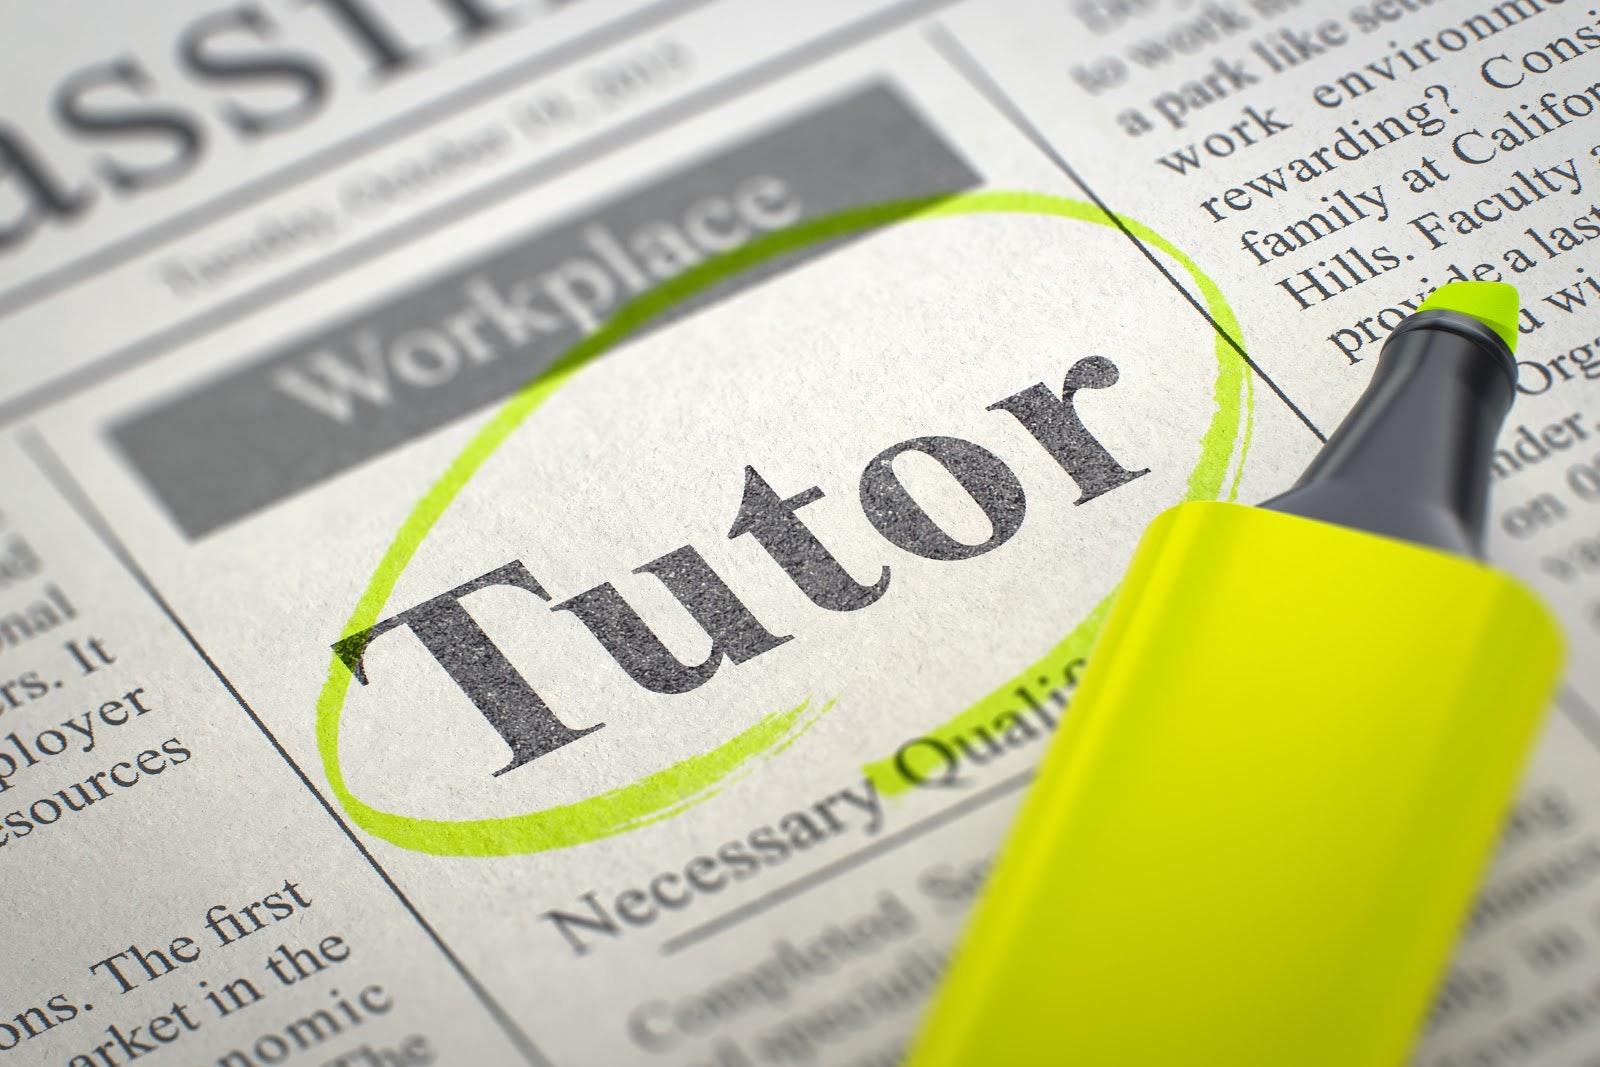 Tutors: a selection of articles